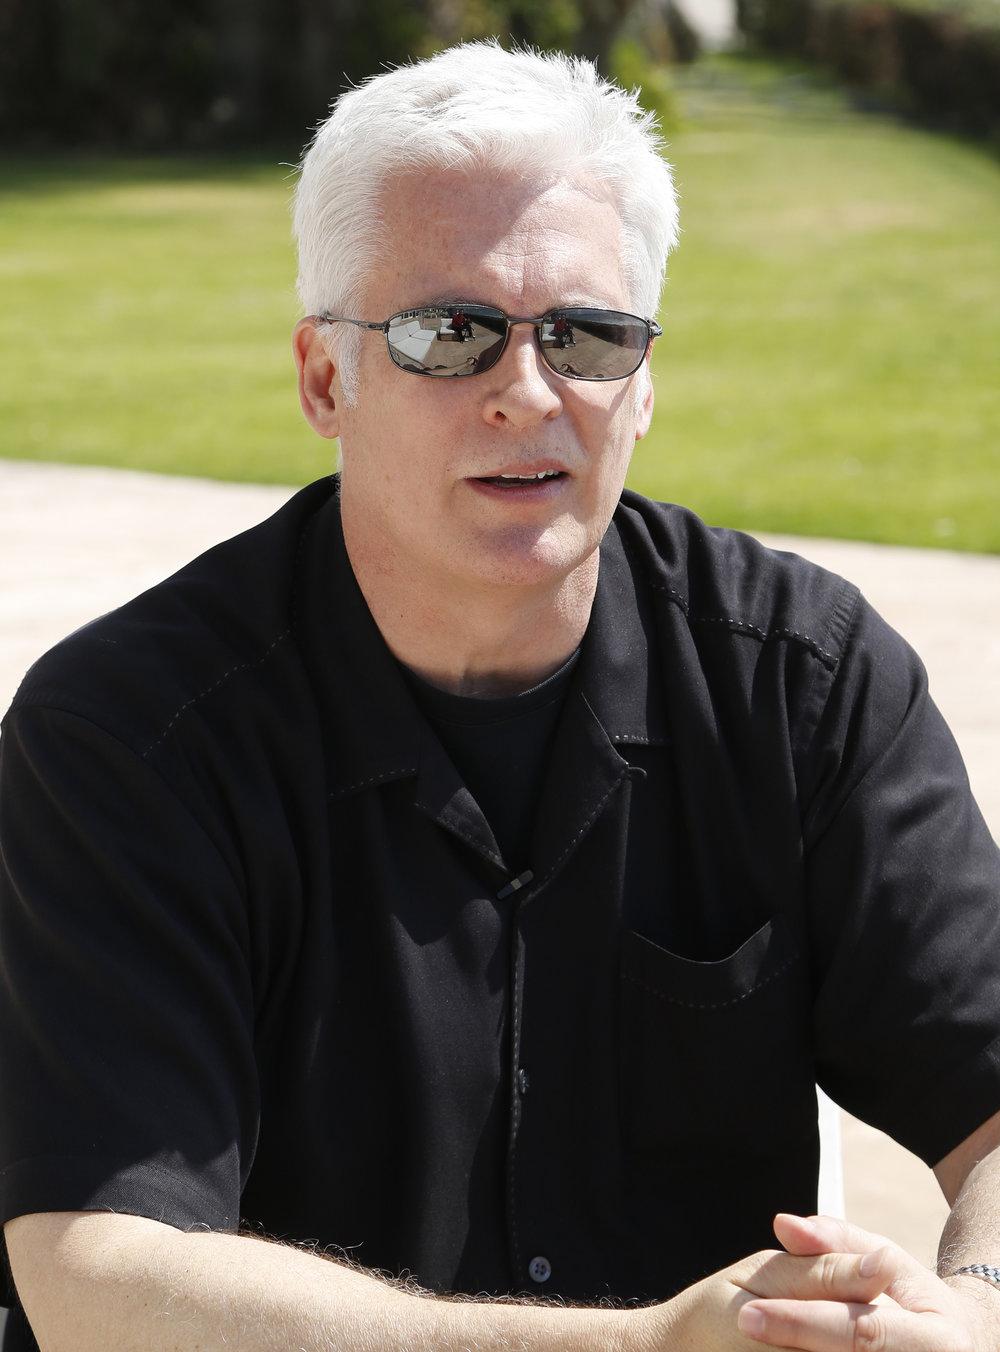 Bob Barrie